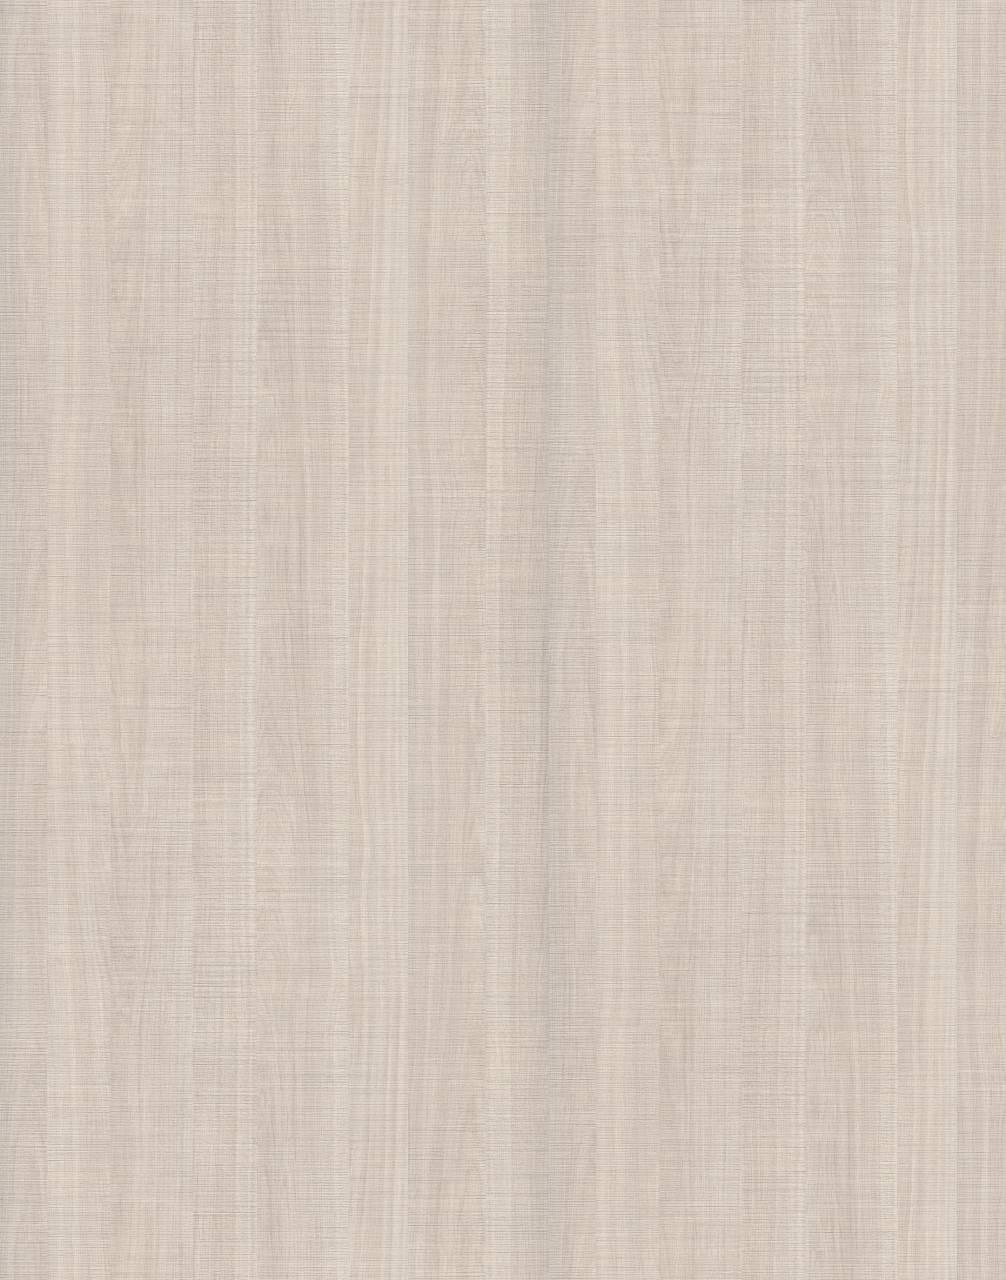 8361 Crossline Latté (MF PB sample)